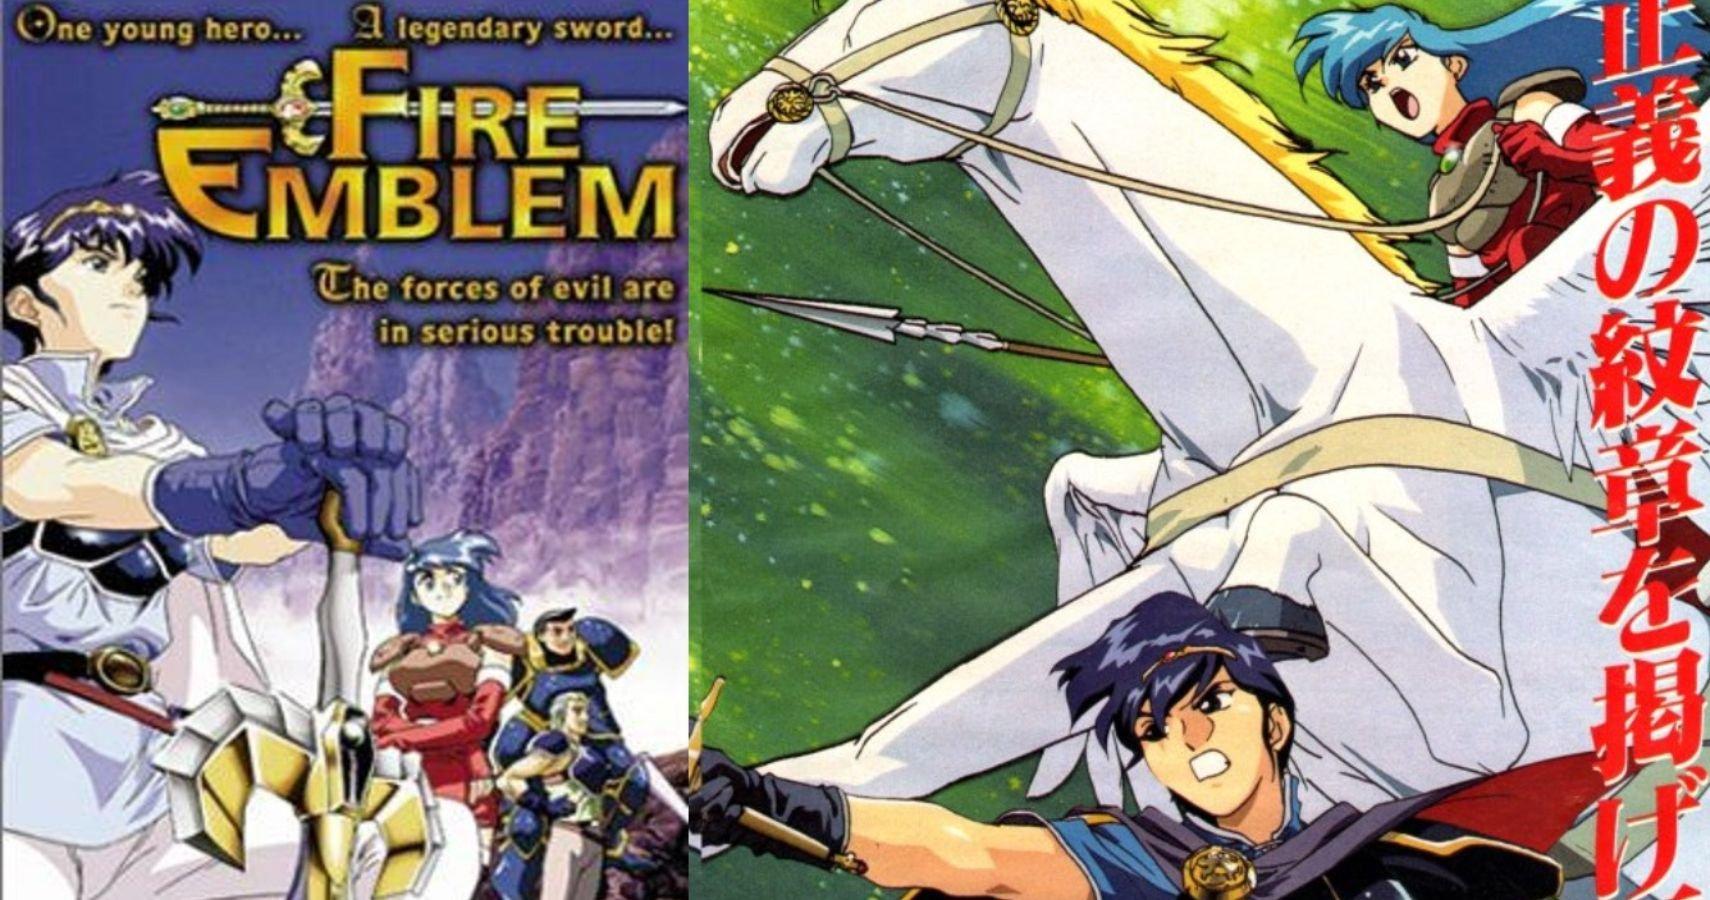 Remembering The Weird, Goofy '90s Fire Emblem Anime